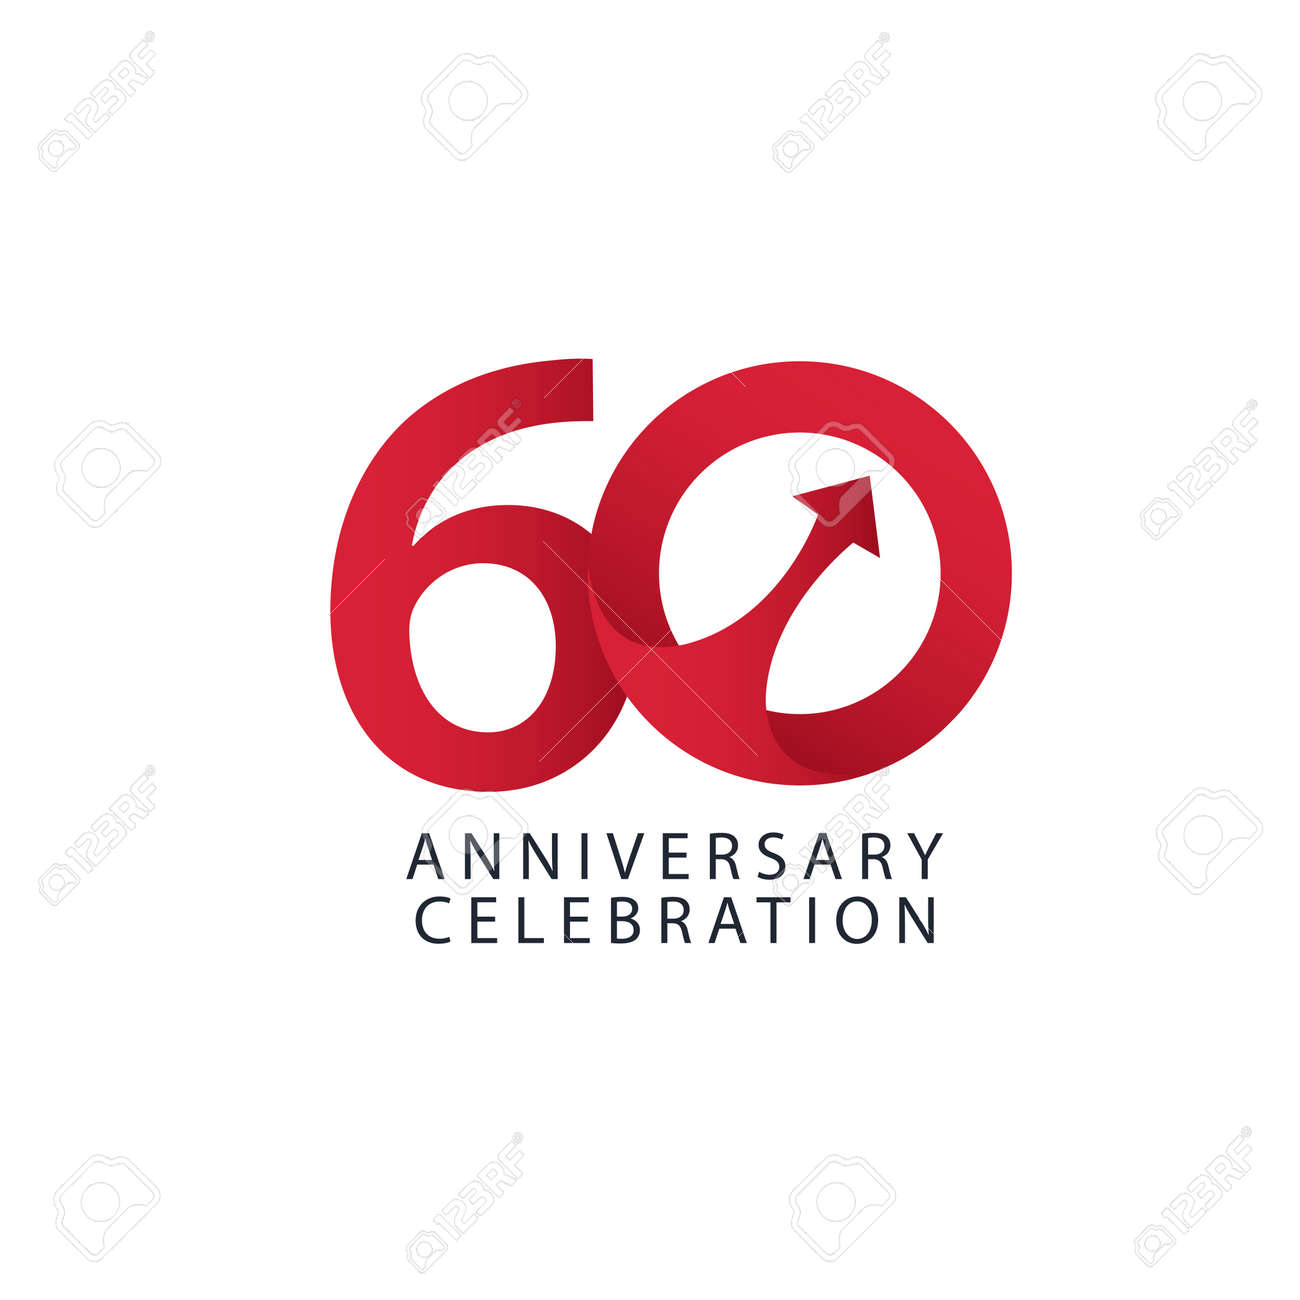 60 Years Anniversary Celebration Vector Template Design Illustration - 163698088